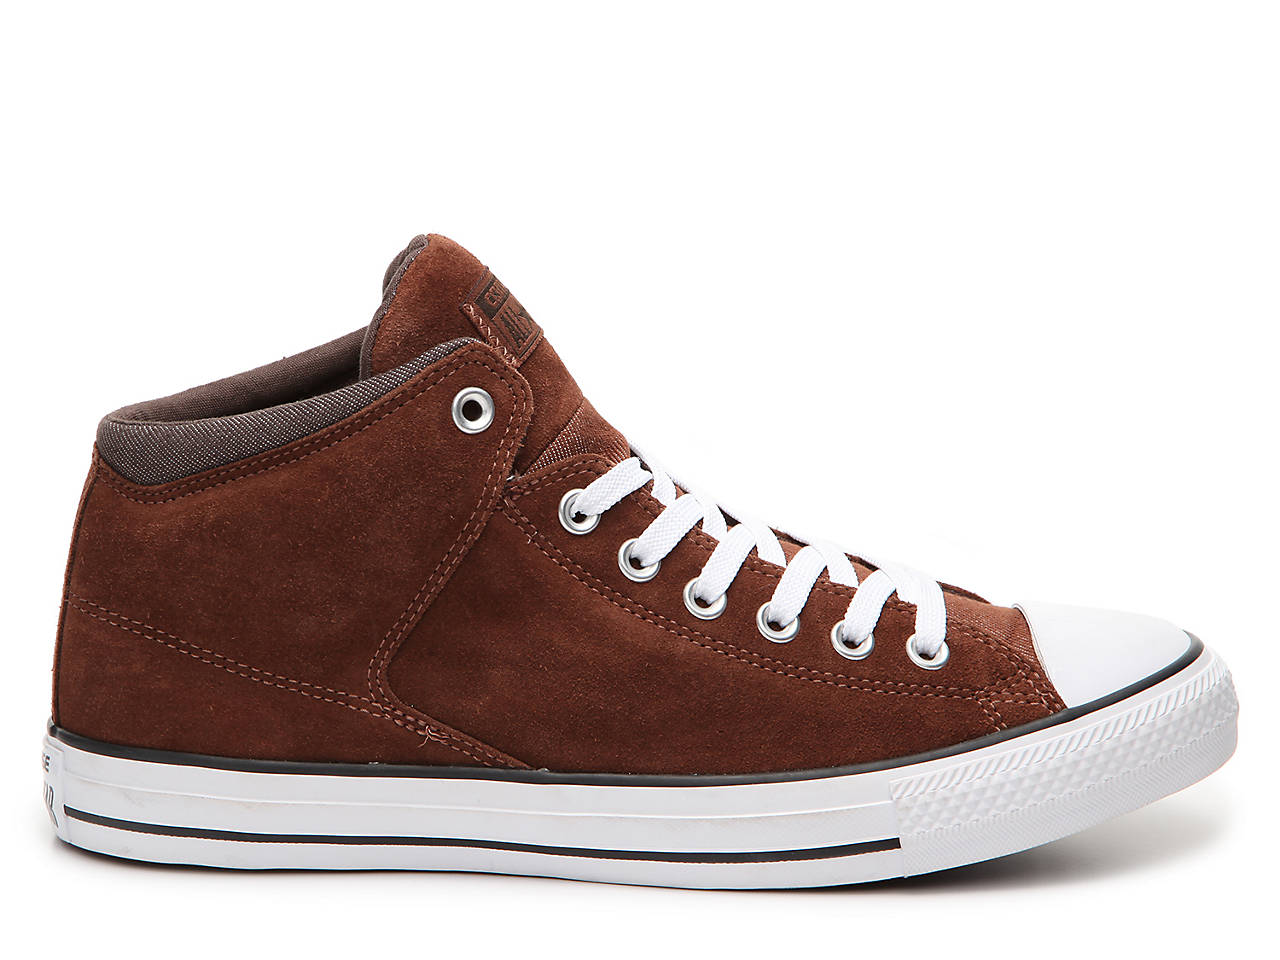 74314aba41f Converse. Chuck Taylor All Star Hi Street Thermal High-Top Sneaker - Men s